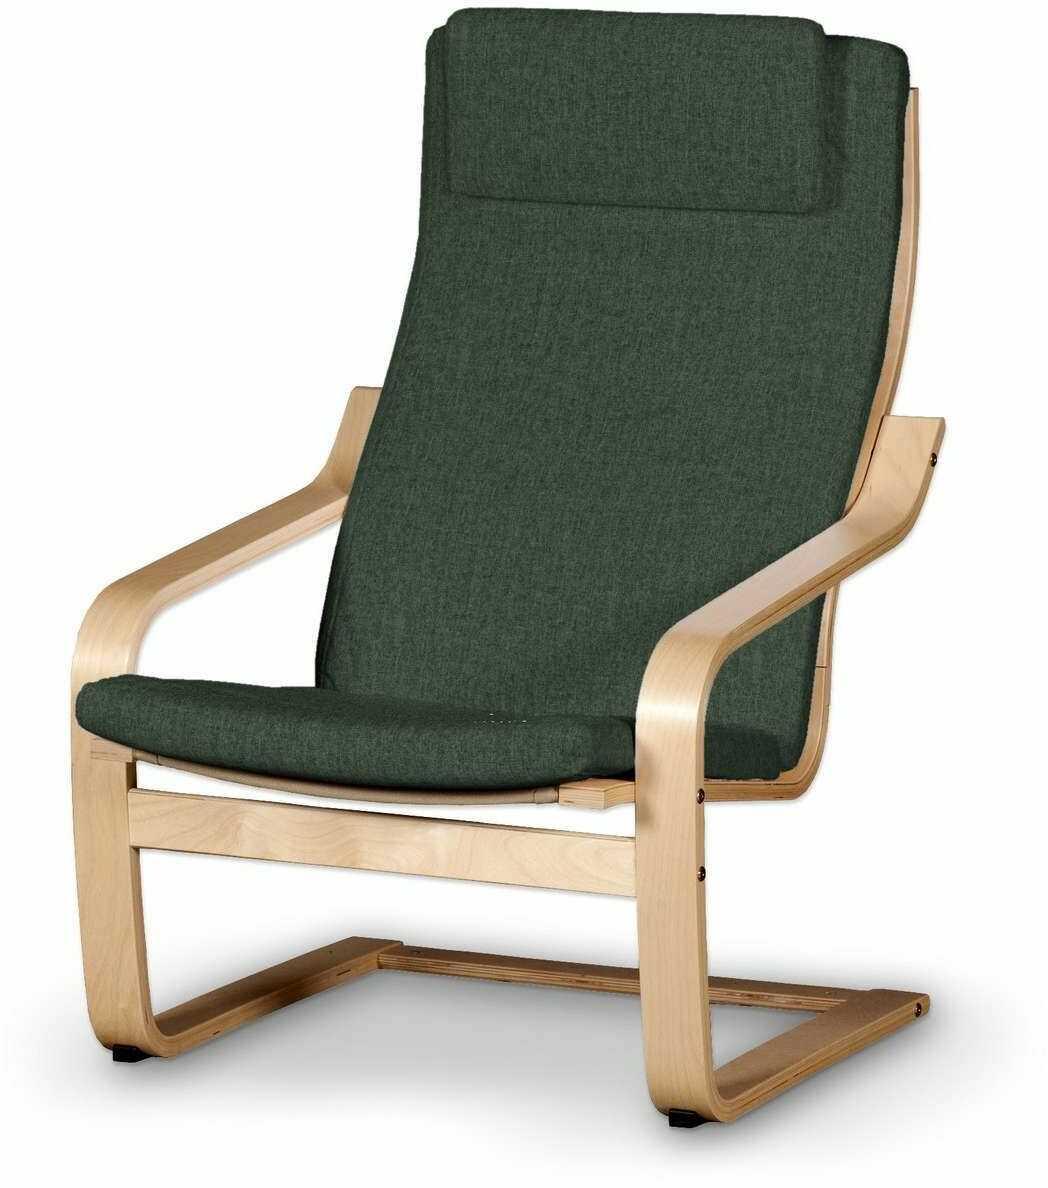 Poduszka na fotel Poäng II, leśna zieleń szenil, Fotel Poäng II, City